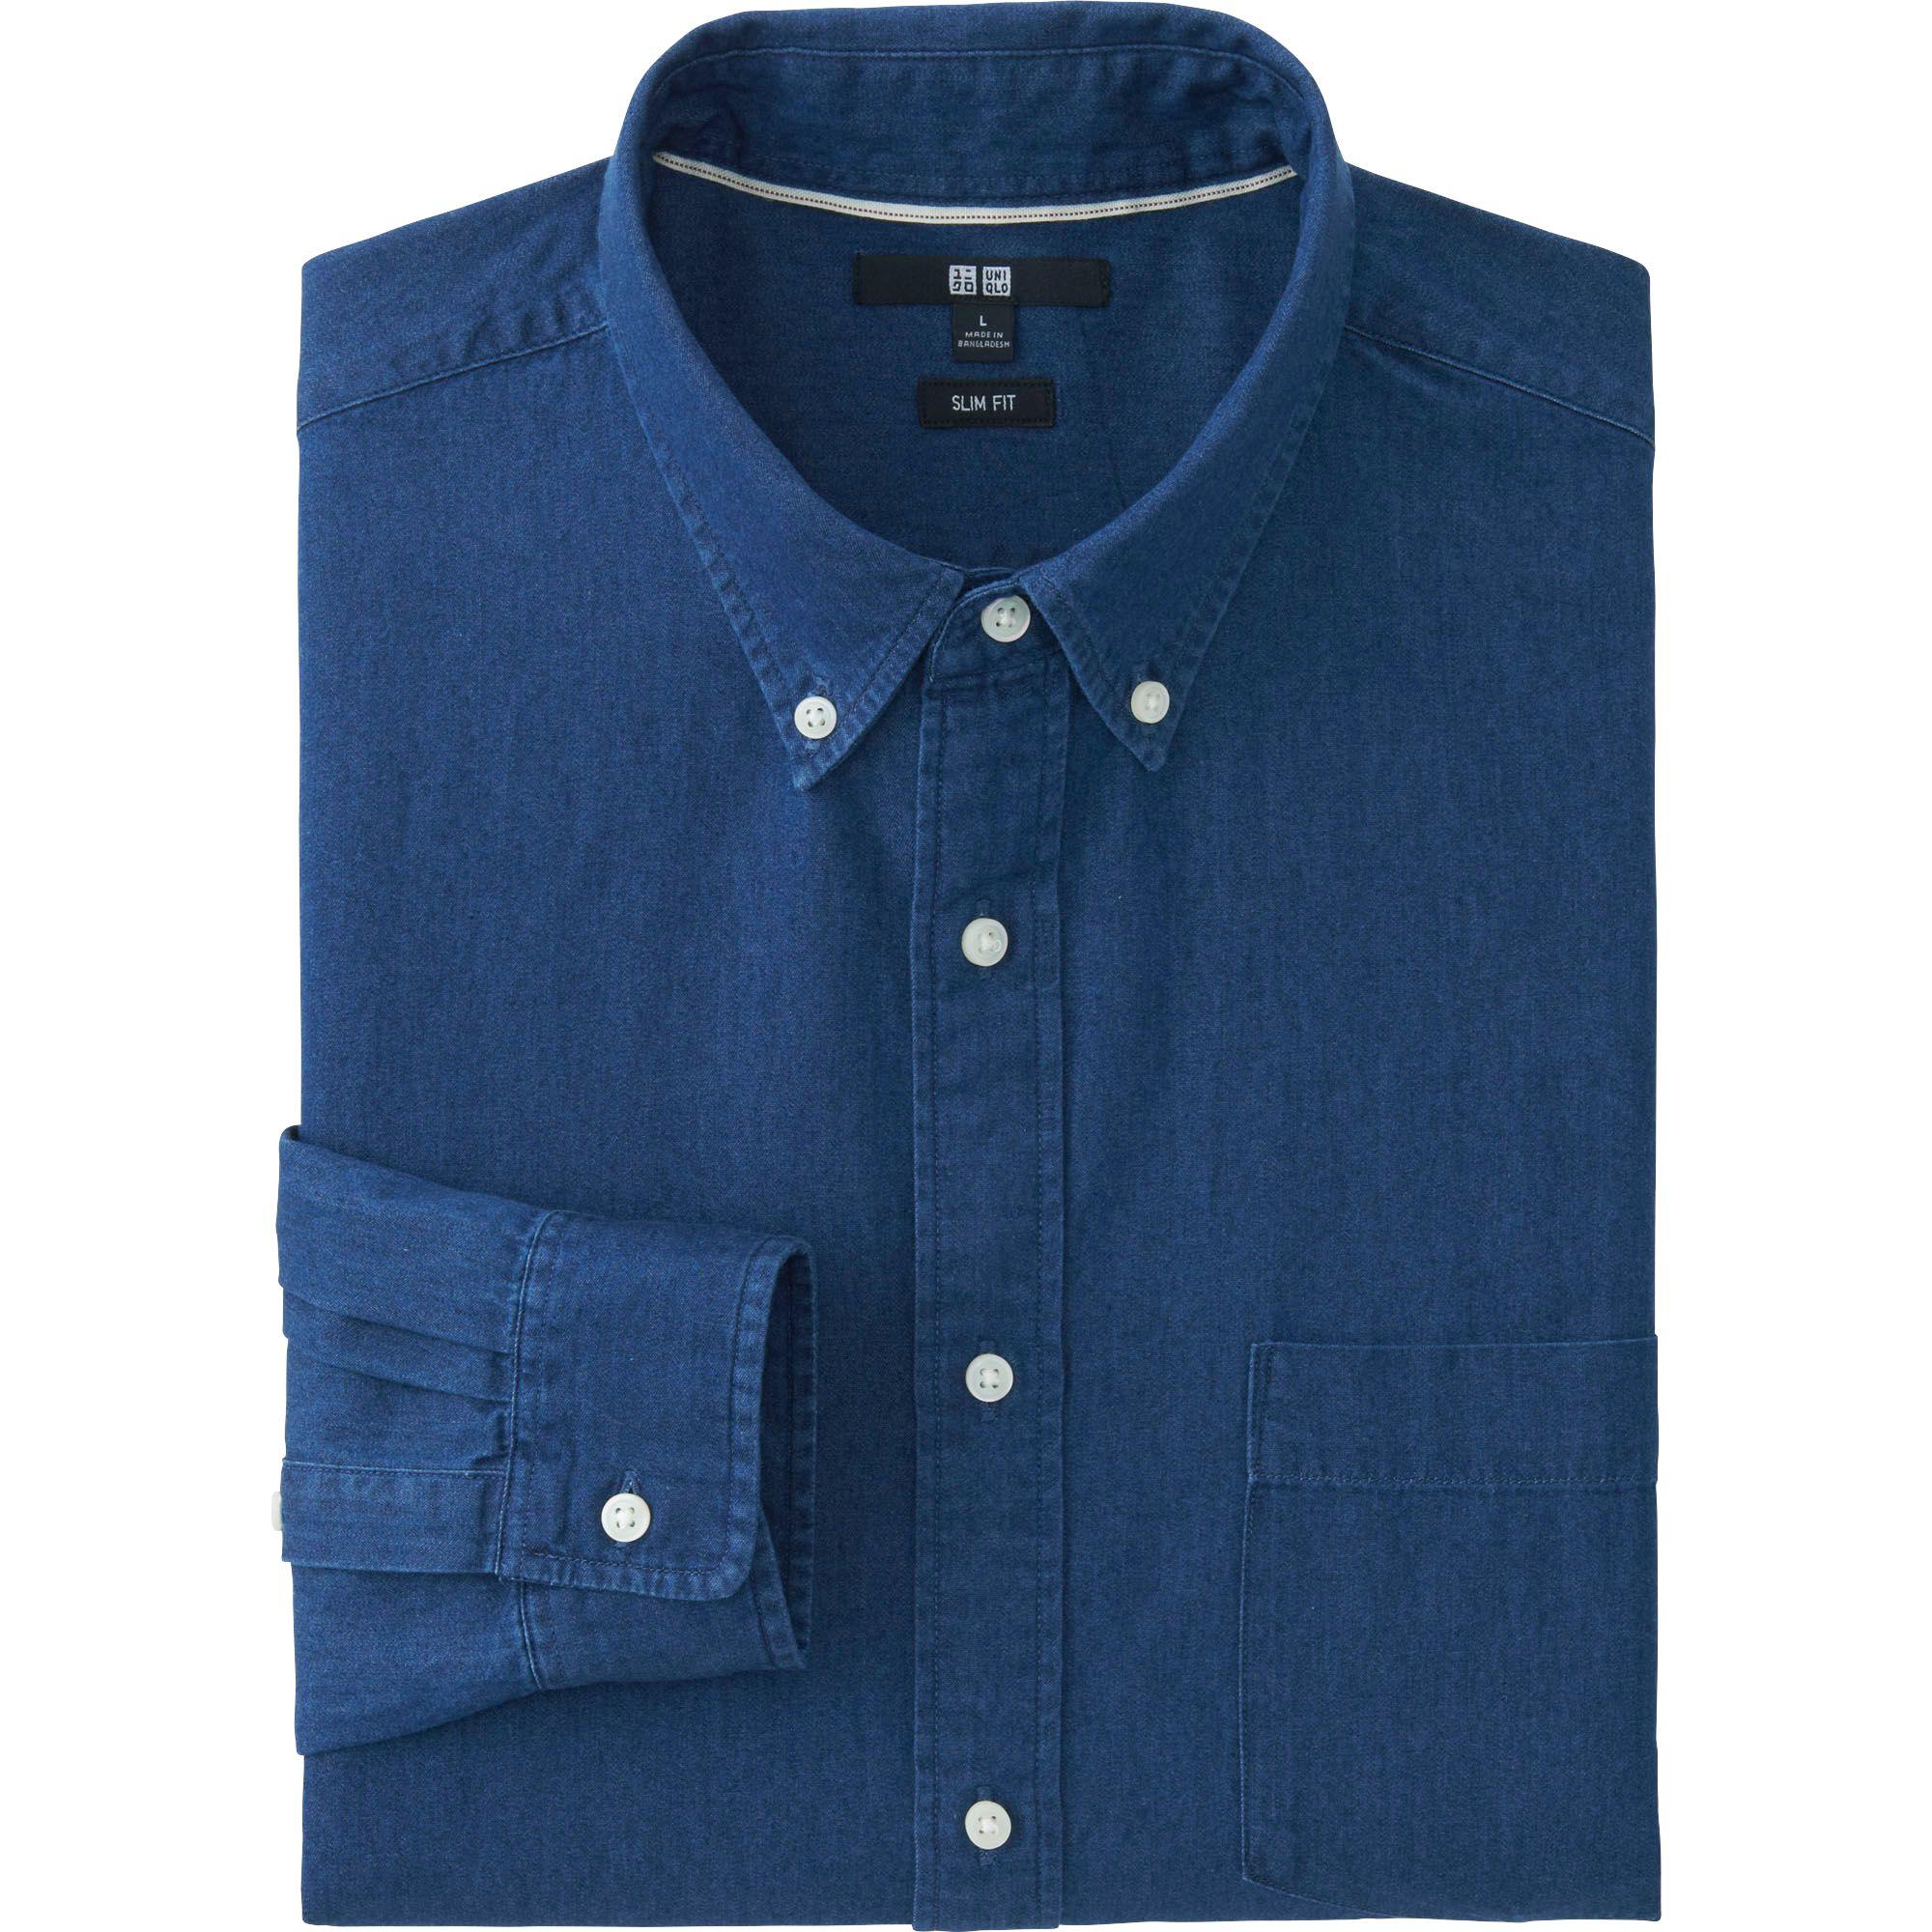 Uniqlo men 39 s slim fit denim shirt in blue for men lyst for Uniqlo t shirt sizing